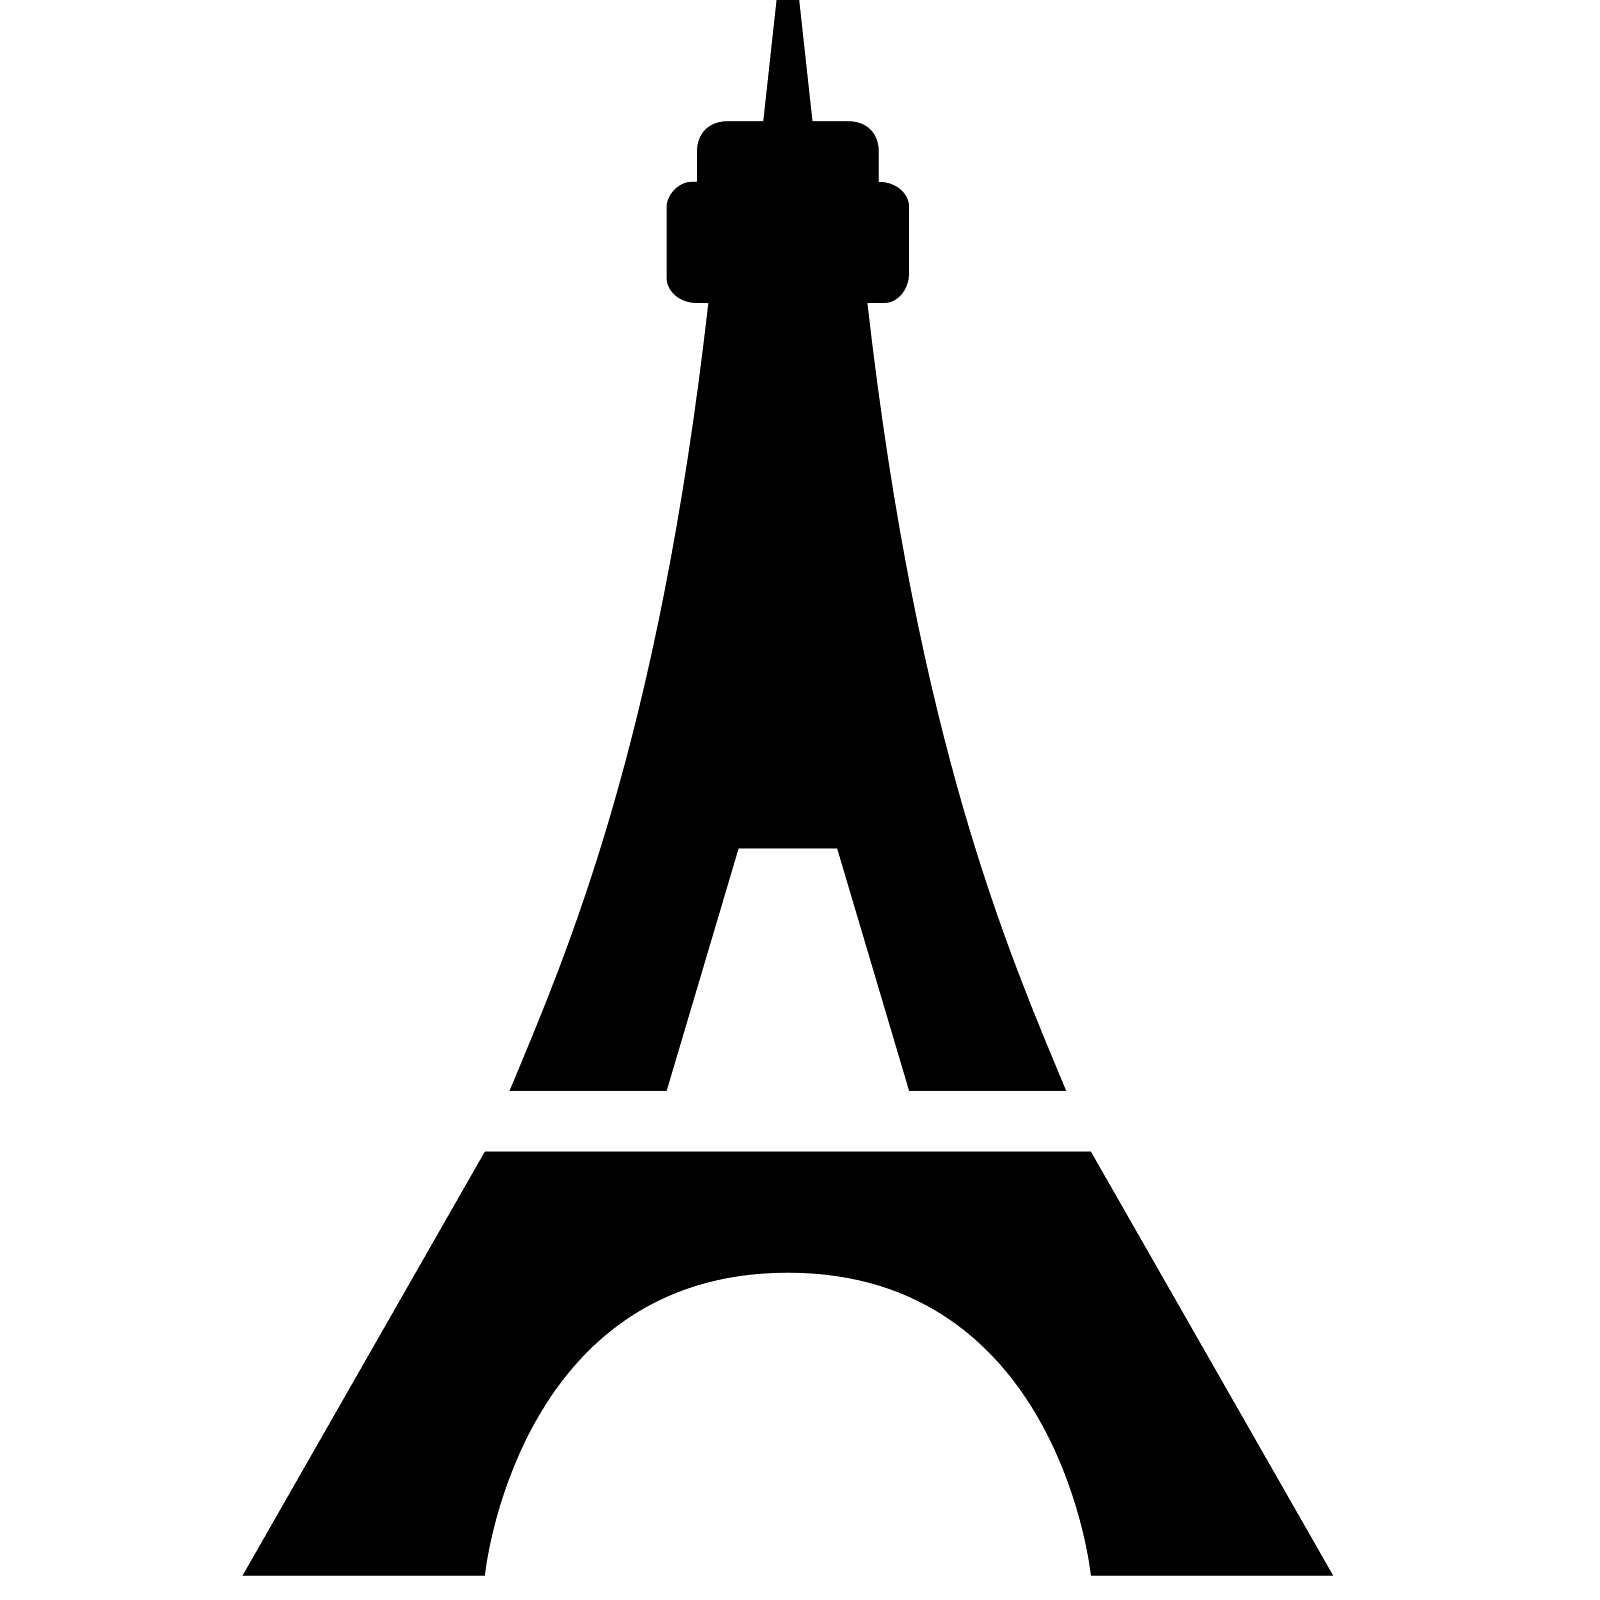 Eiffel tower heart clipart clipart free download Eiffel Tower Icon - free download, PNG and vector clipart free download